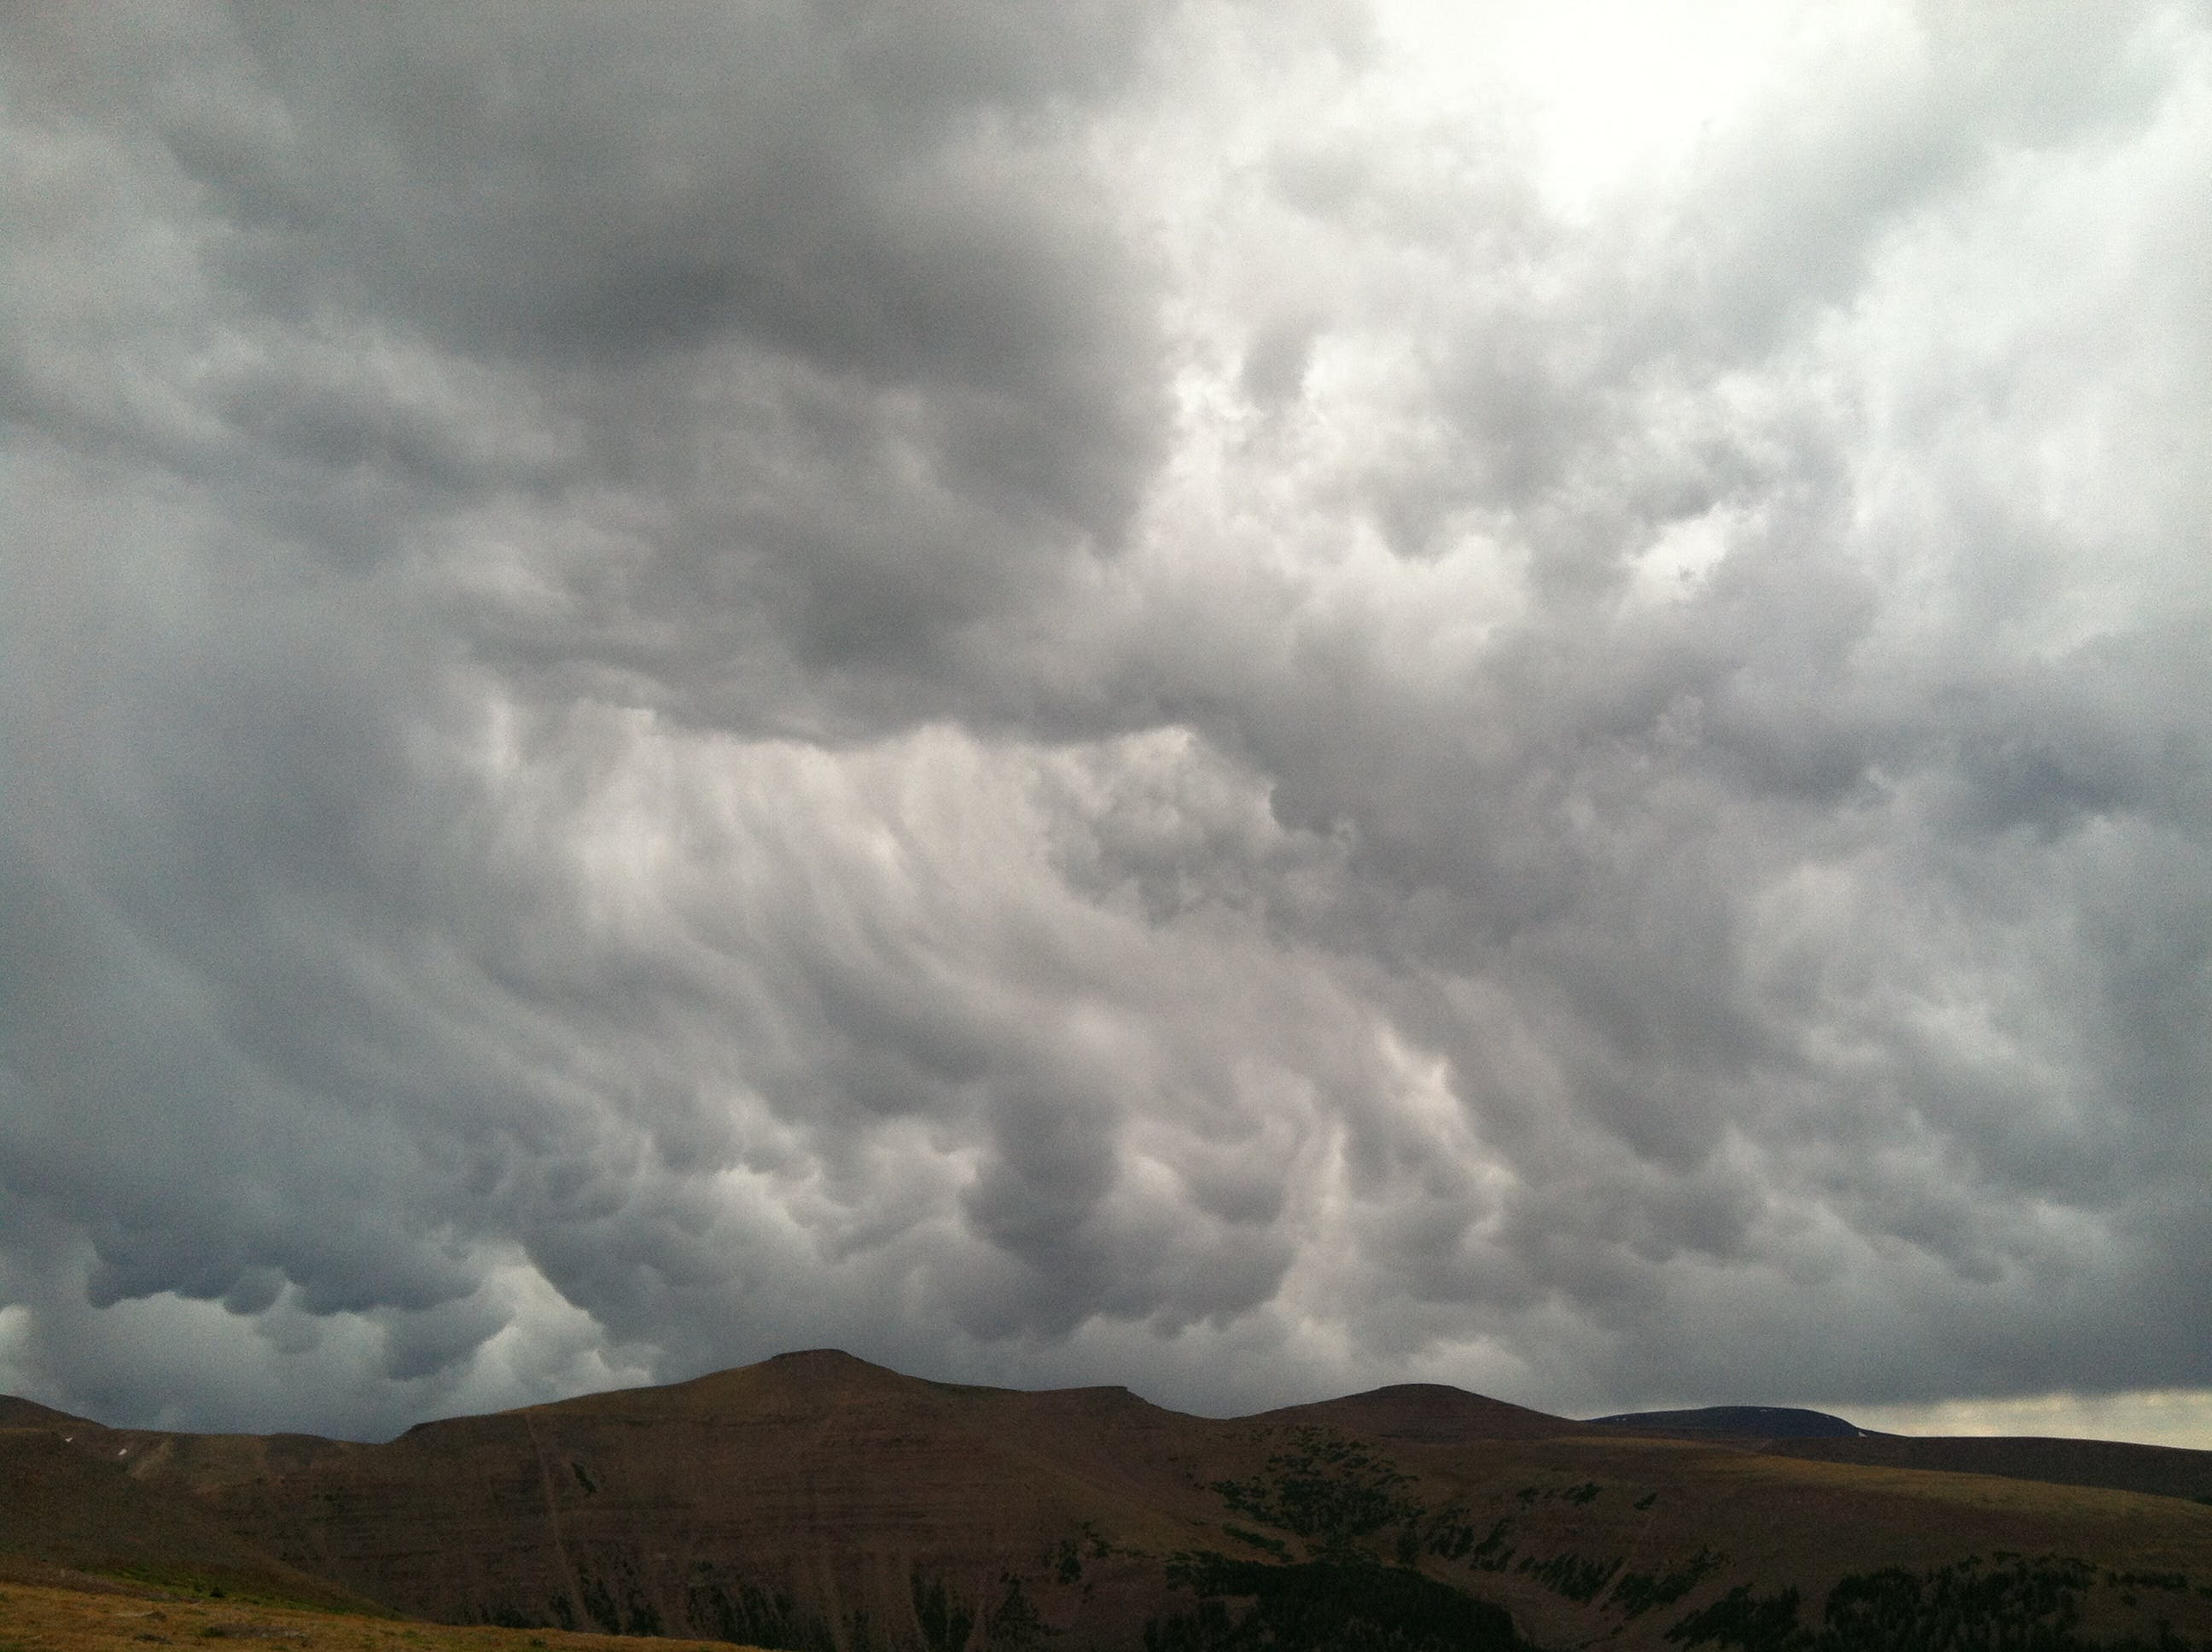 Free stock photo of Joe Leineweber, Thunderclouds, uinta mountains